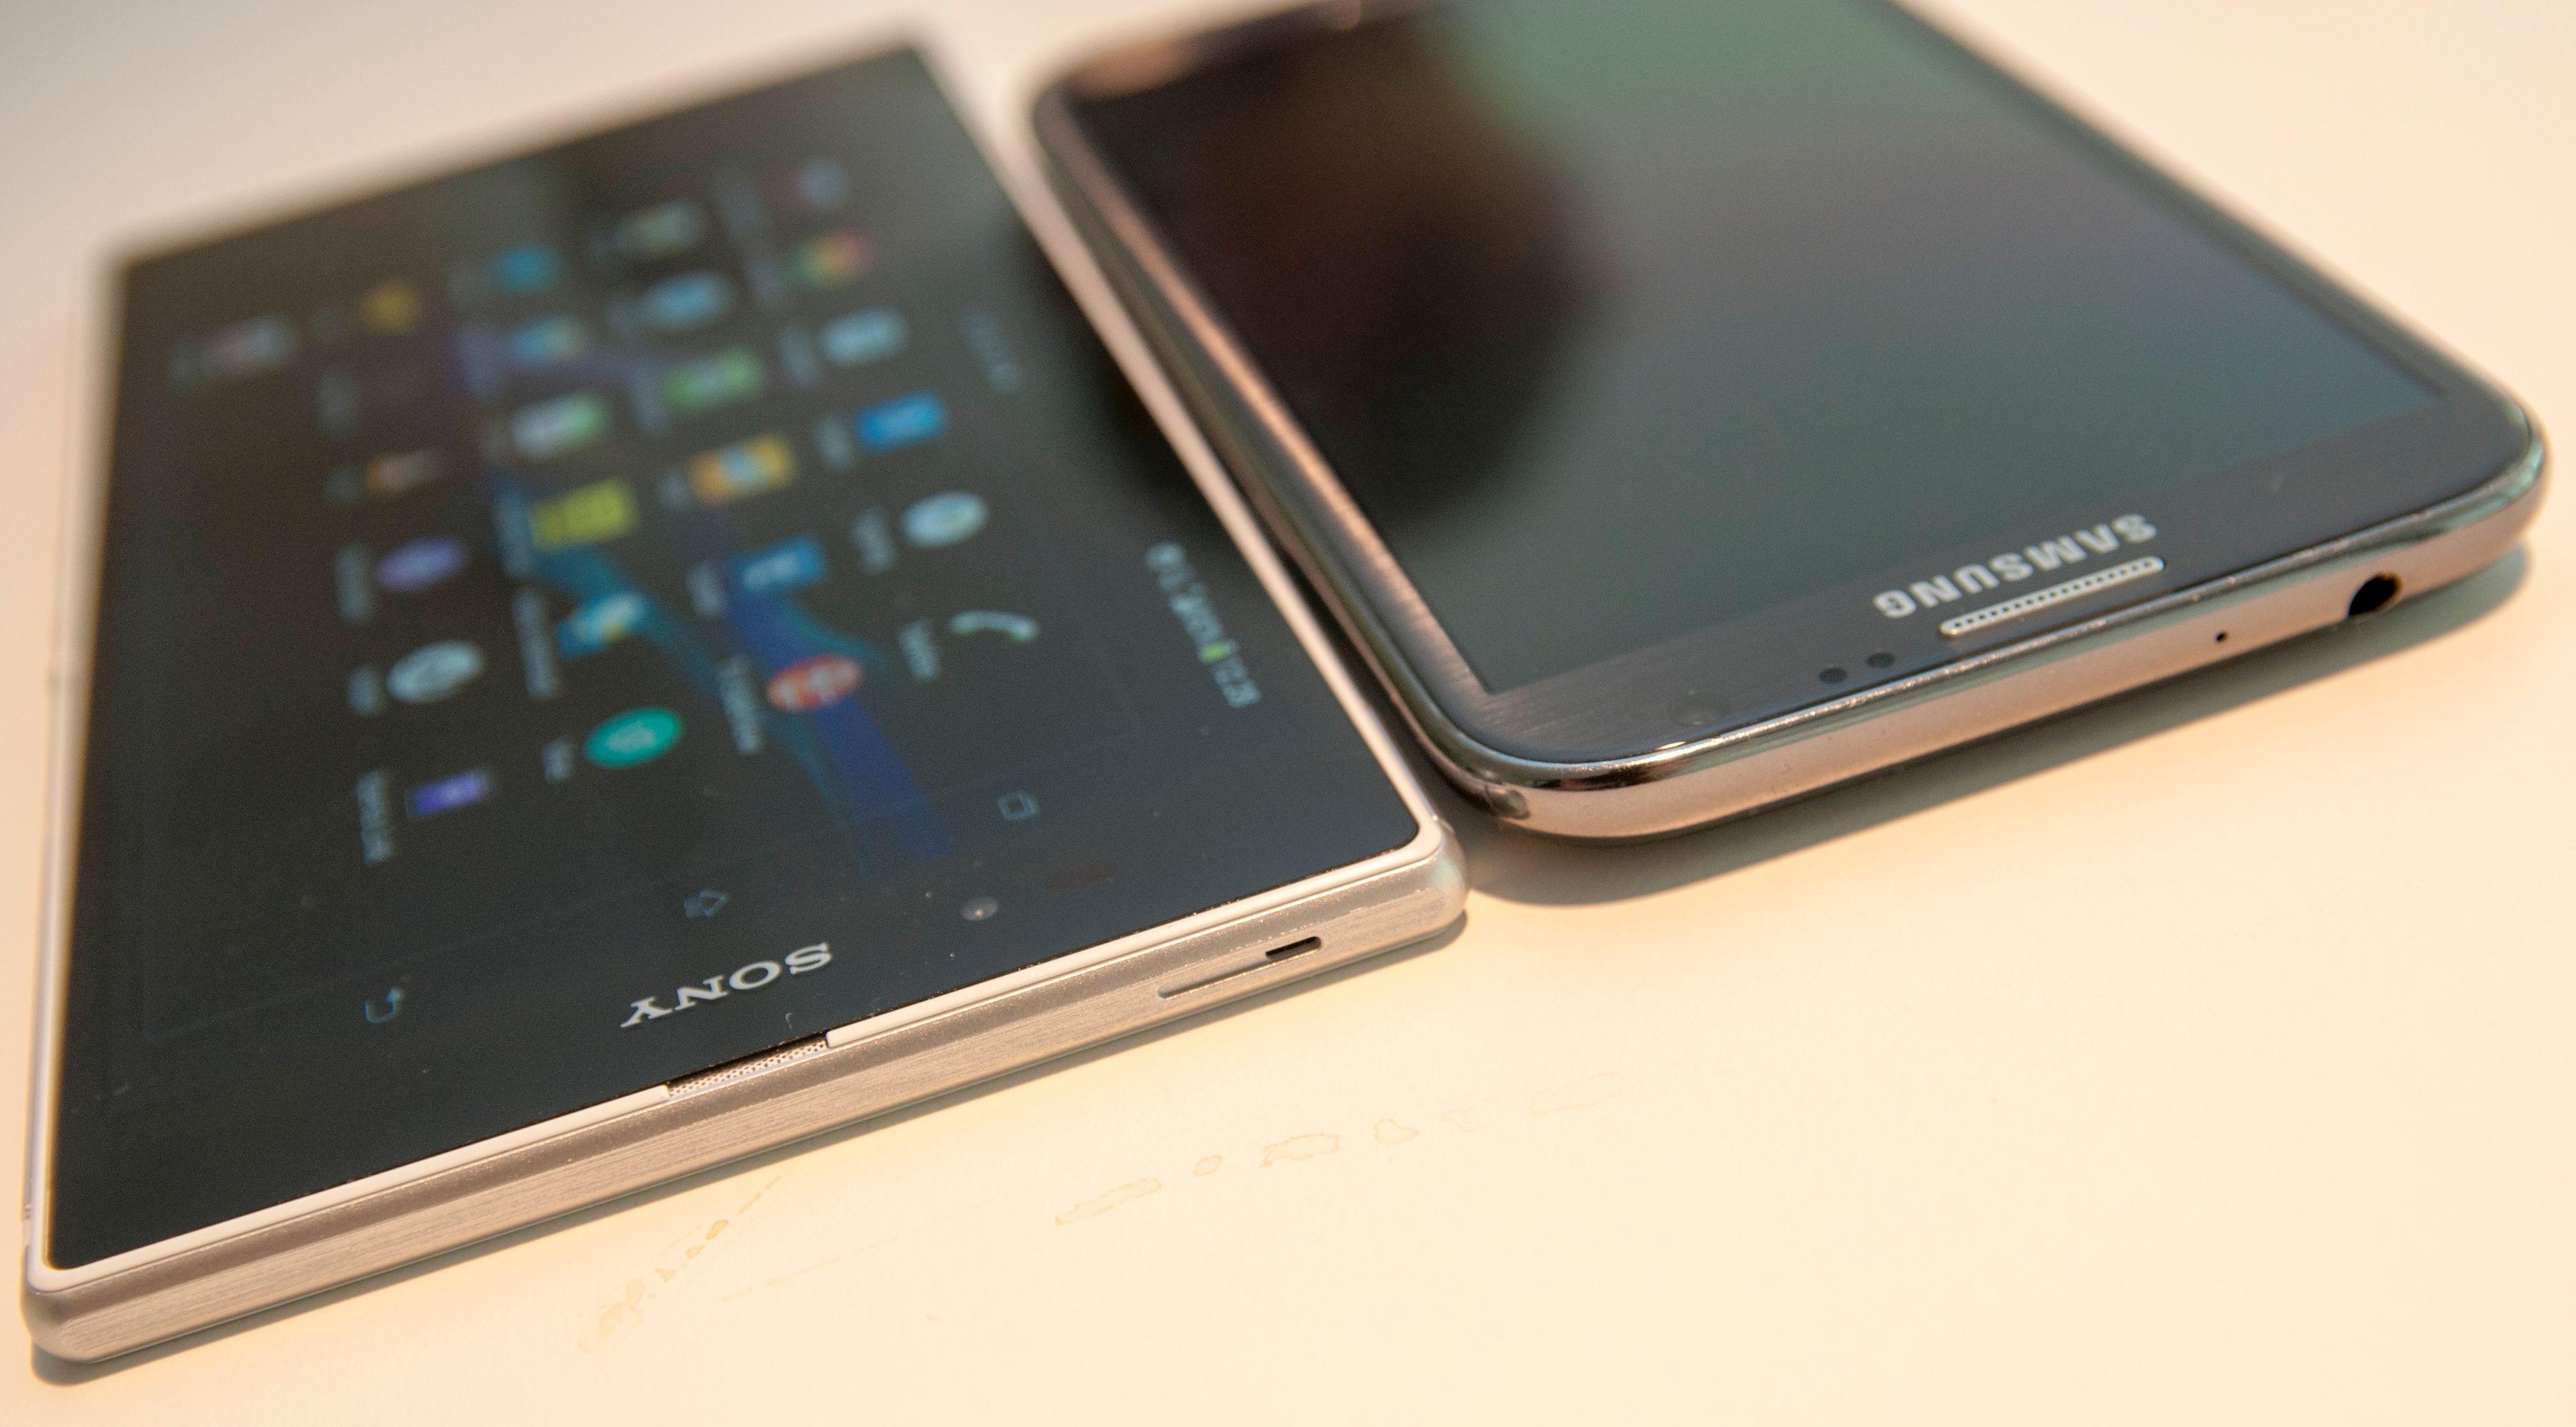 Samsungs Galaxy Note-serie var de første